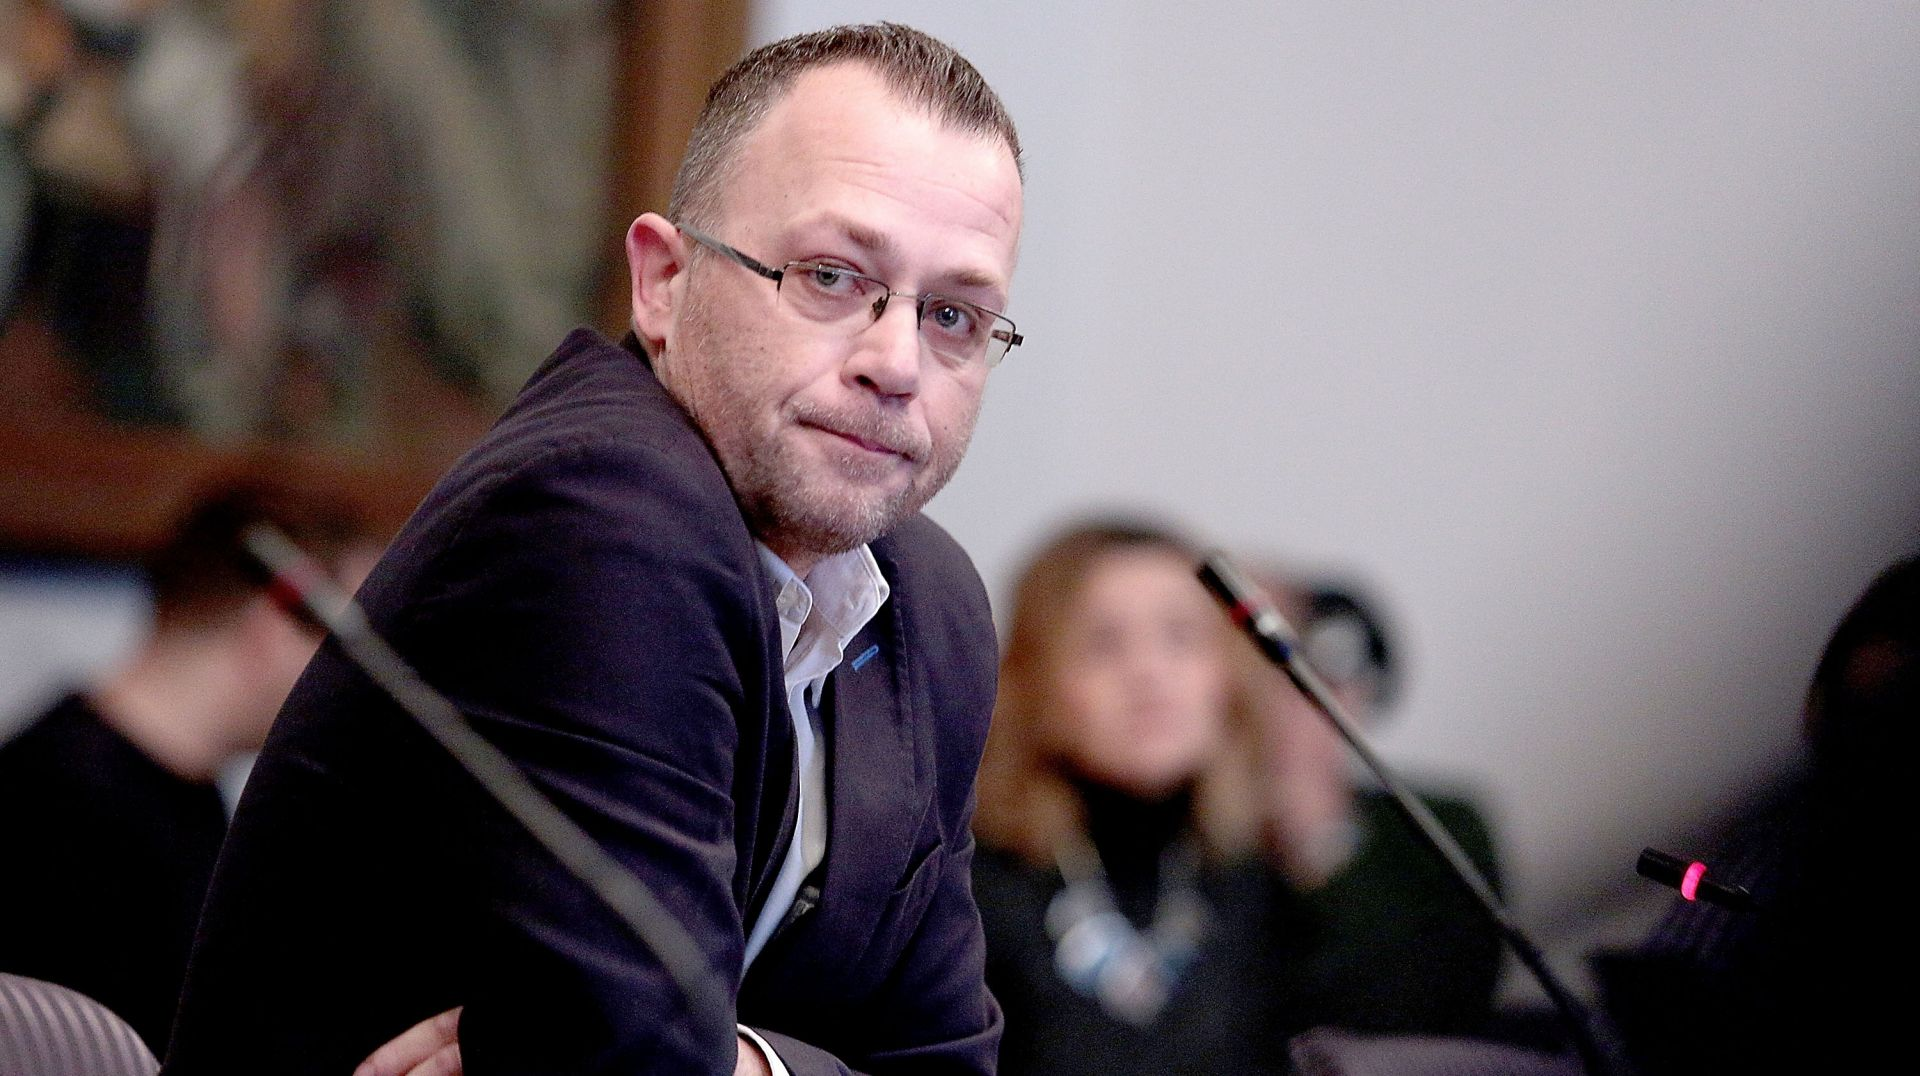 HNiP izjavu Centra Wiesenthal o ministru Hasanbegoviću smatra neprihvatljivom i neutemeljenom